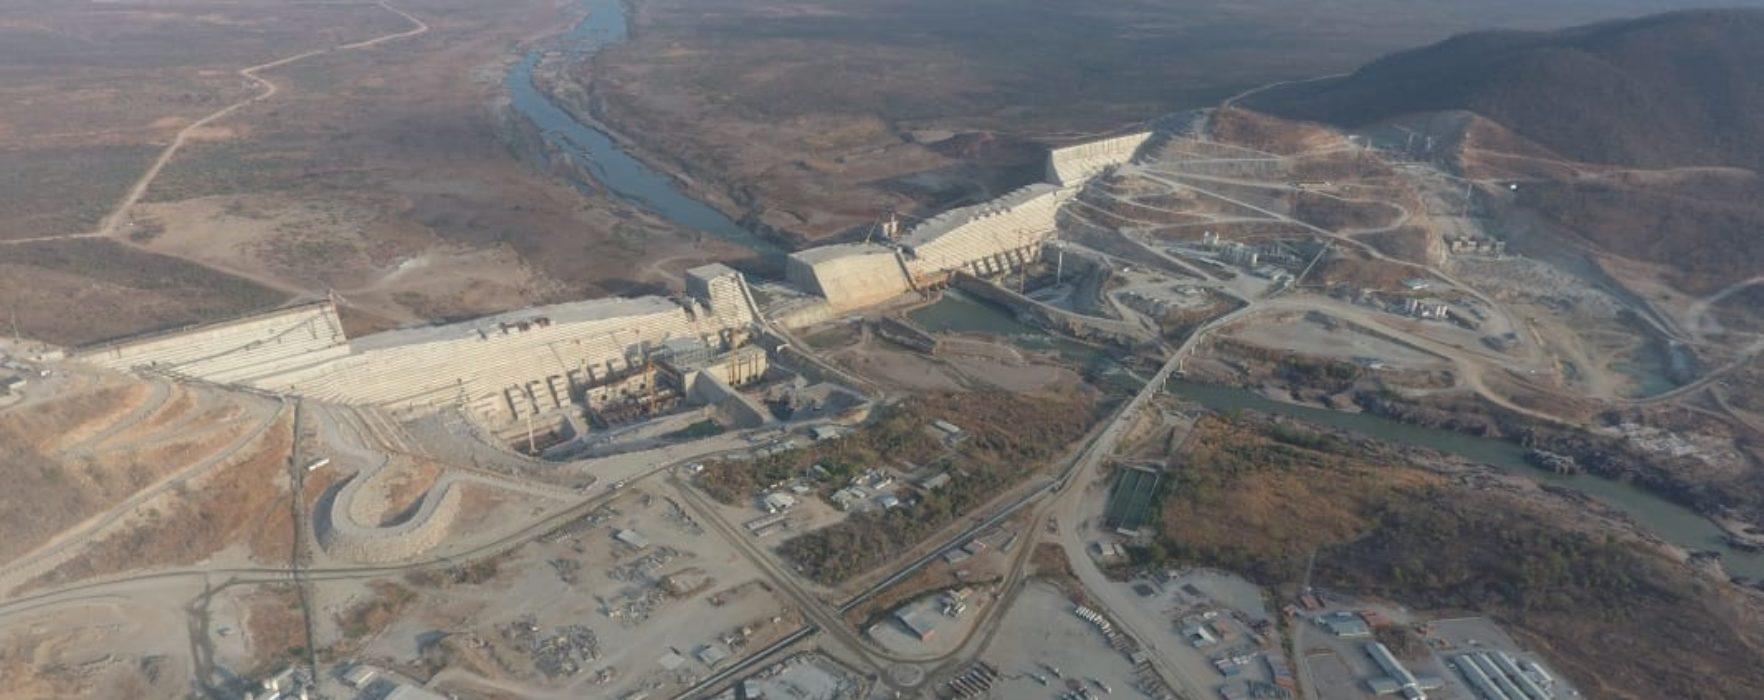 Nile runtipui khamin Ethiopia ram in ti luang kham pan hang